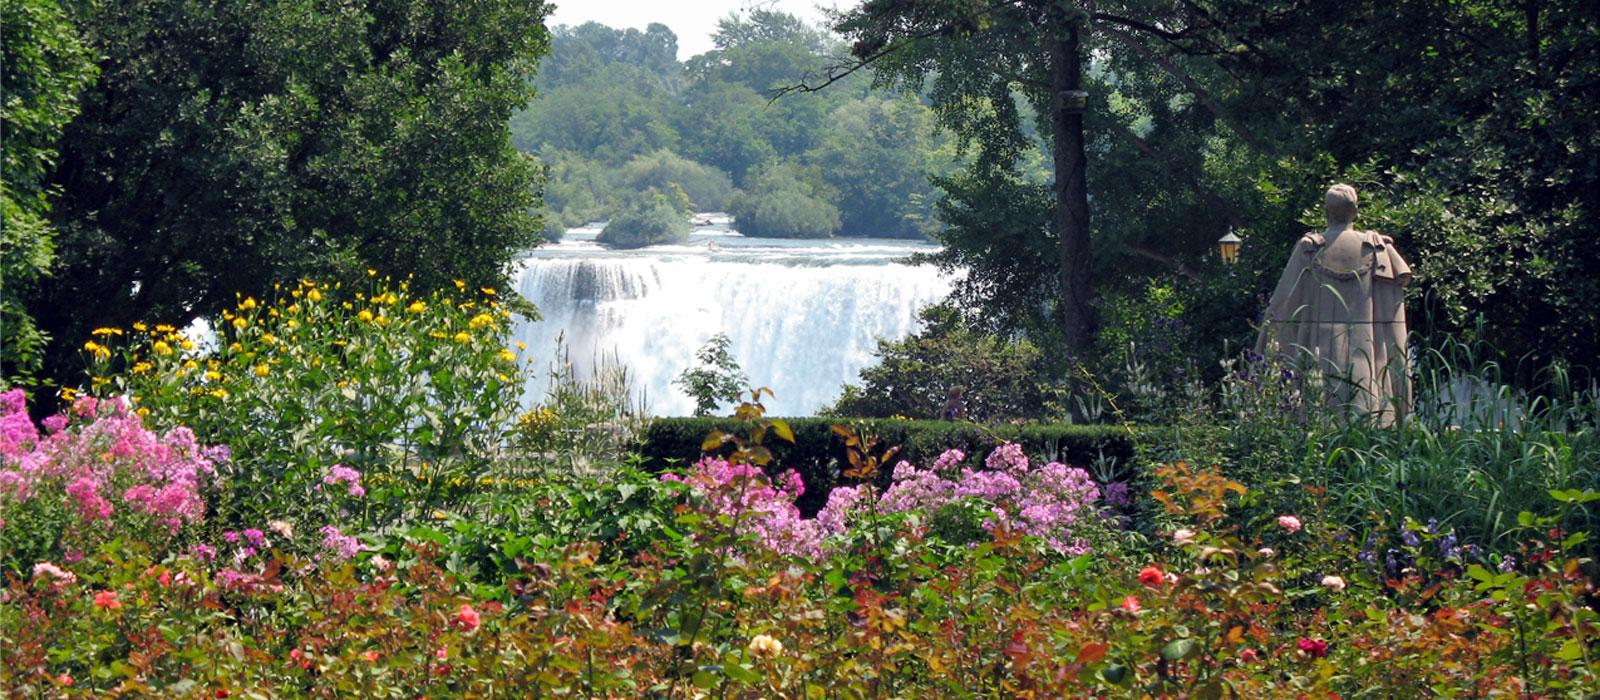 niagara-falls-pic